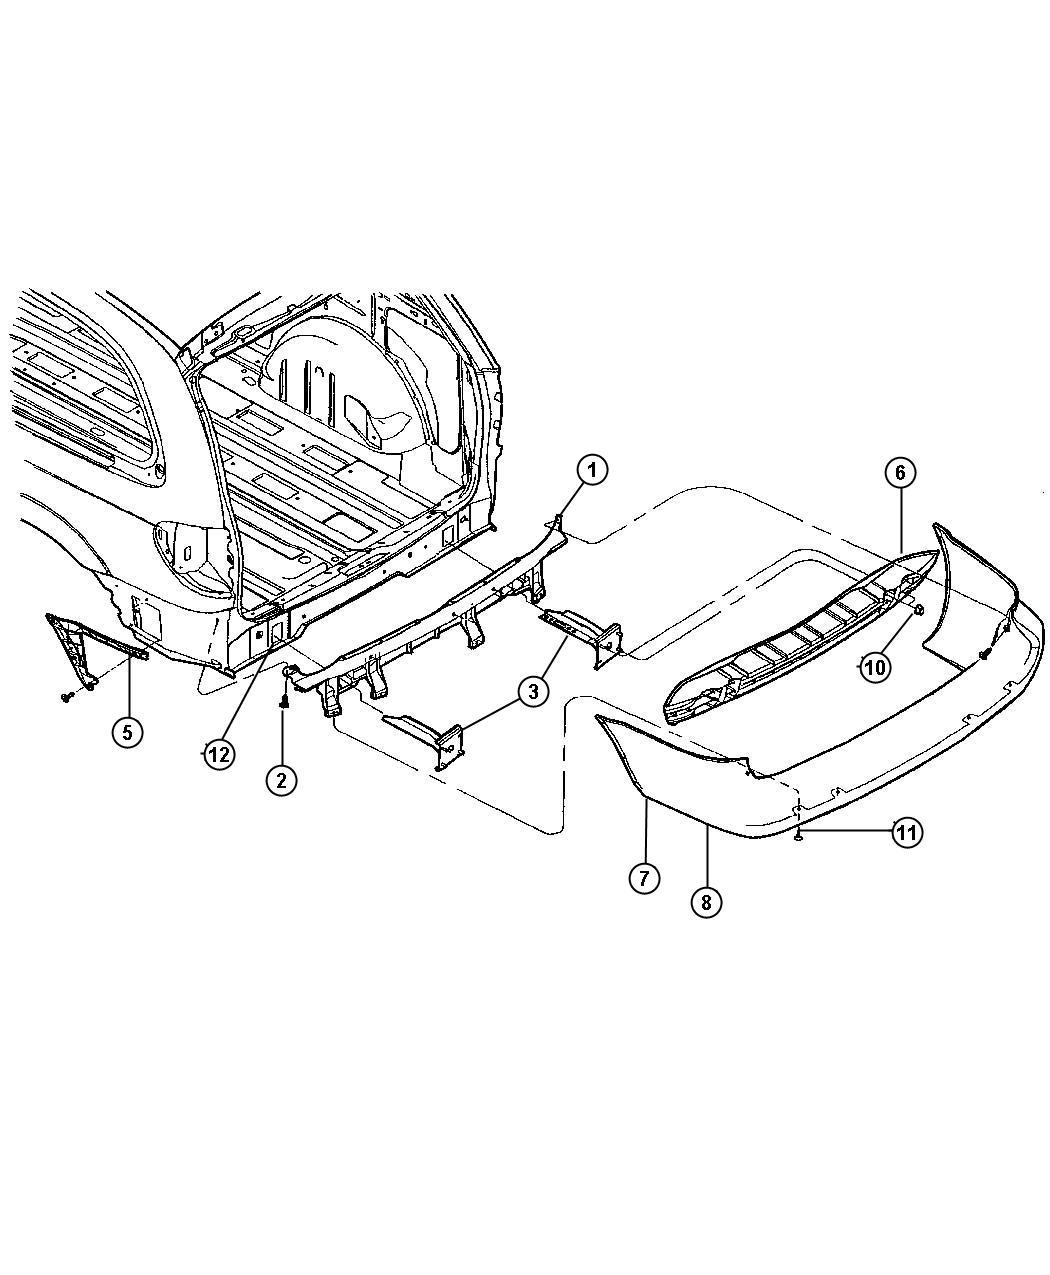 2001 Chrysler Voyager Fascia. Rear. Primed. Mln, body